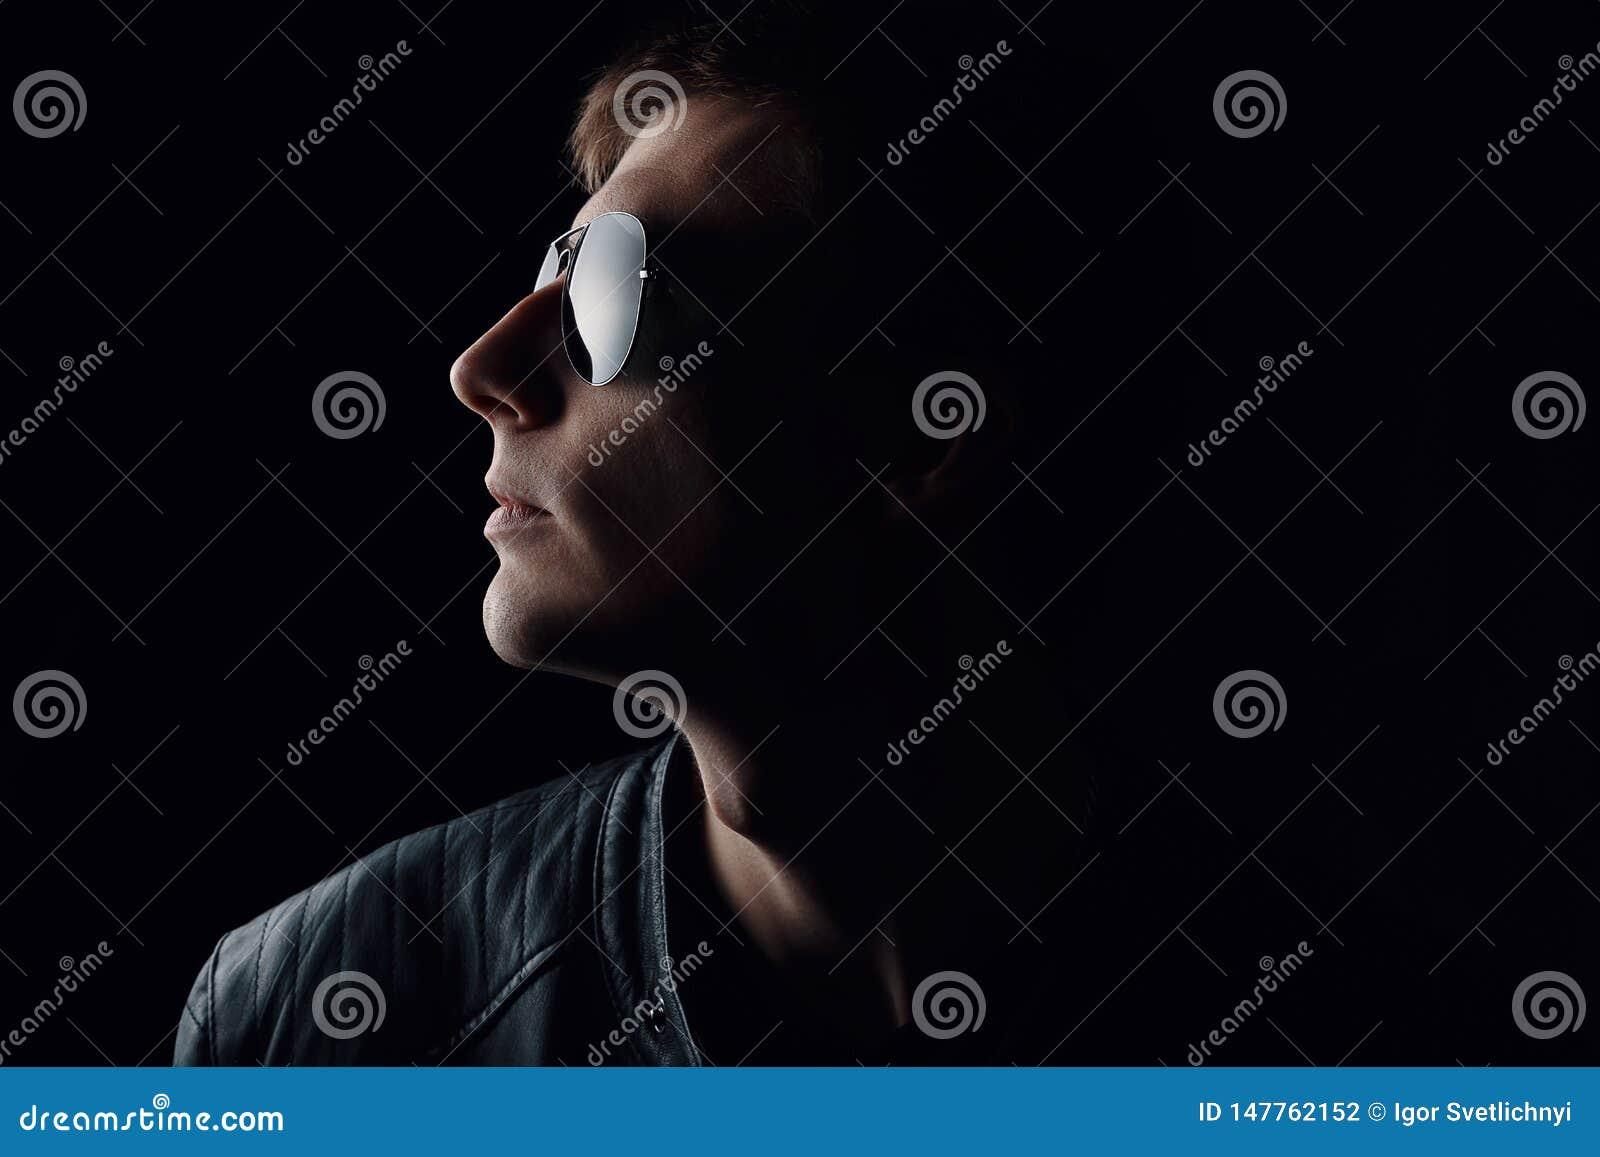 Barnmans st?ende N?rbild av den allvarliga unga mannen i ett svartl?deromslag och solglas?gon p? m?rk bakgrund